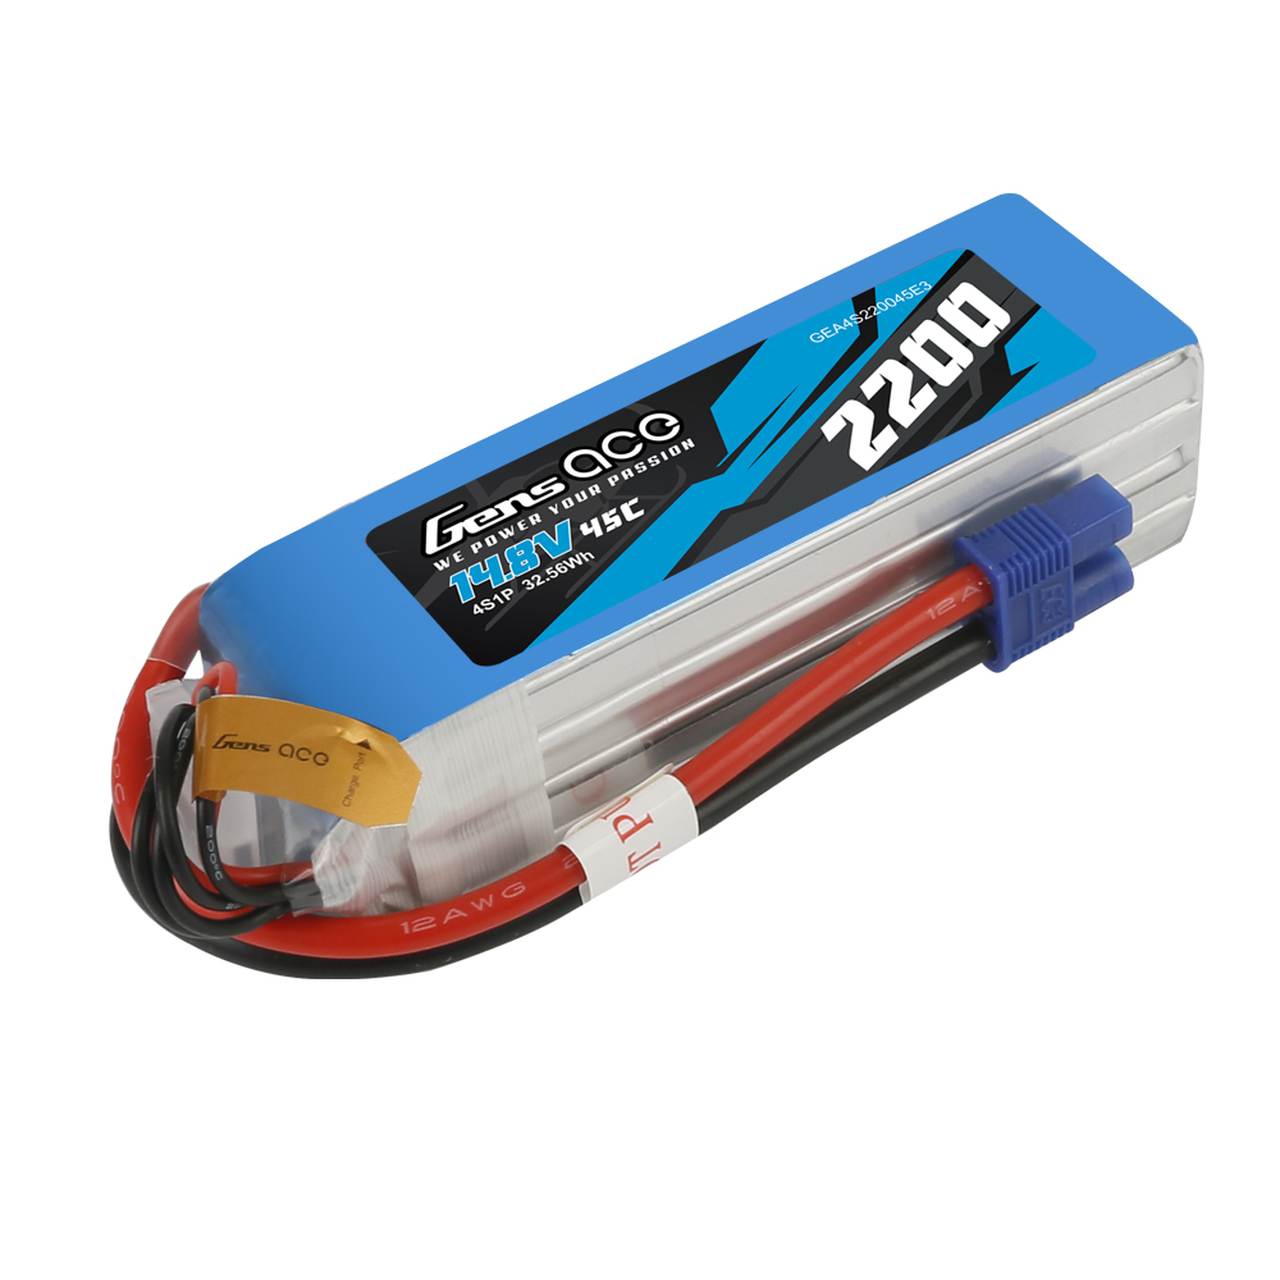 Gens ace 2200mAh  45C 14.8V 4S1P Lipo Battery Pack with EC3 Plug